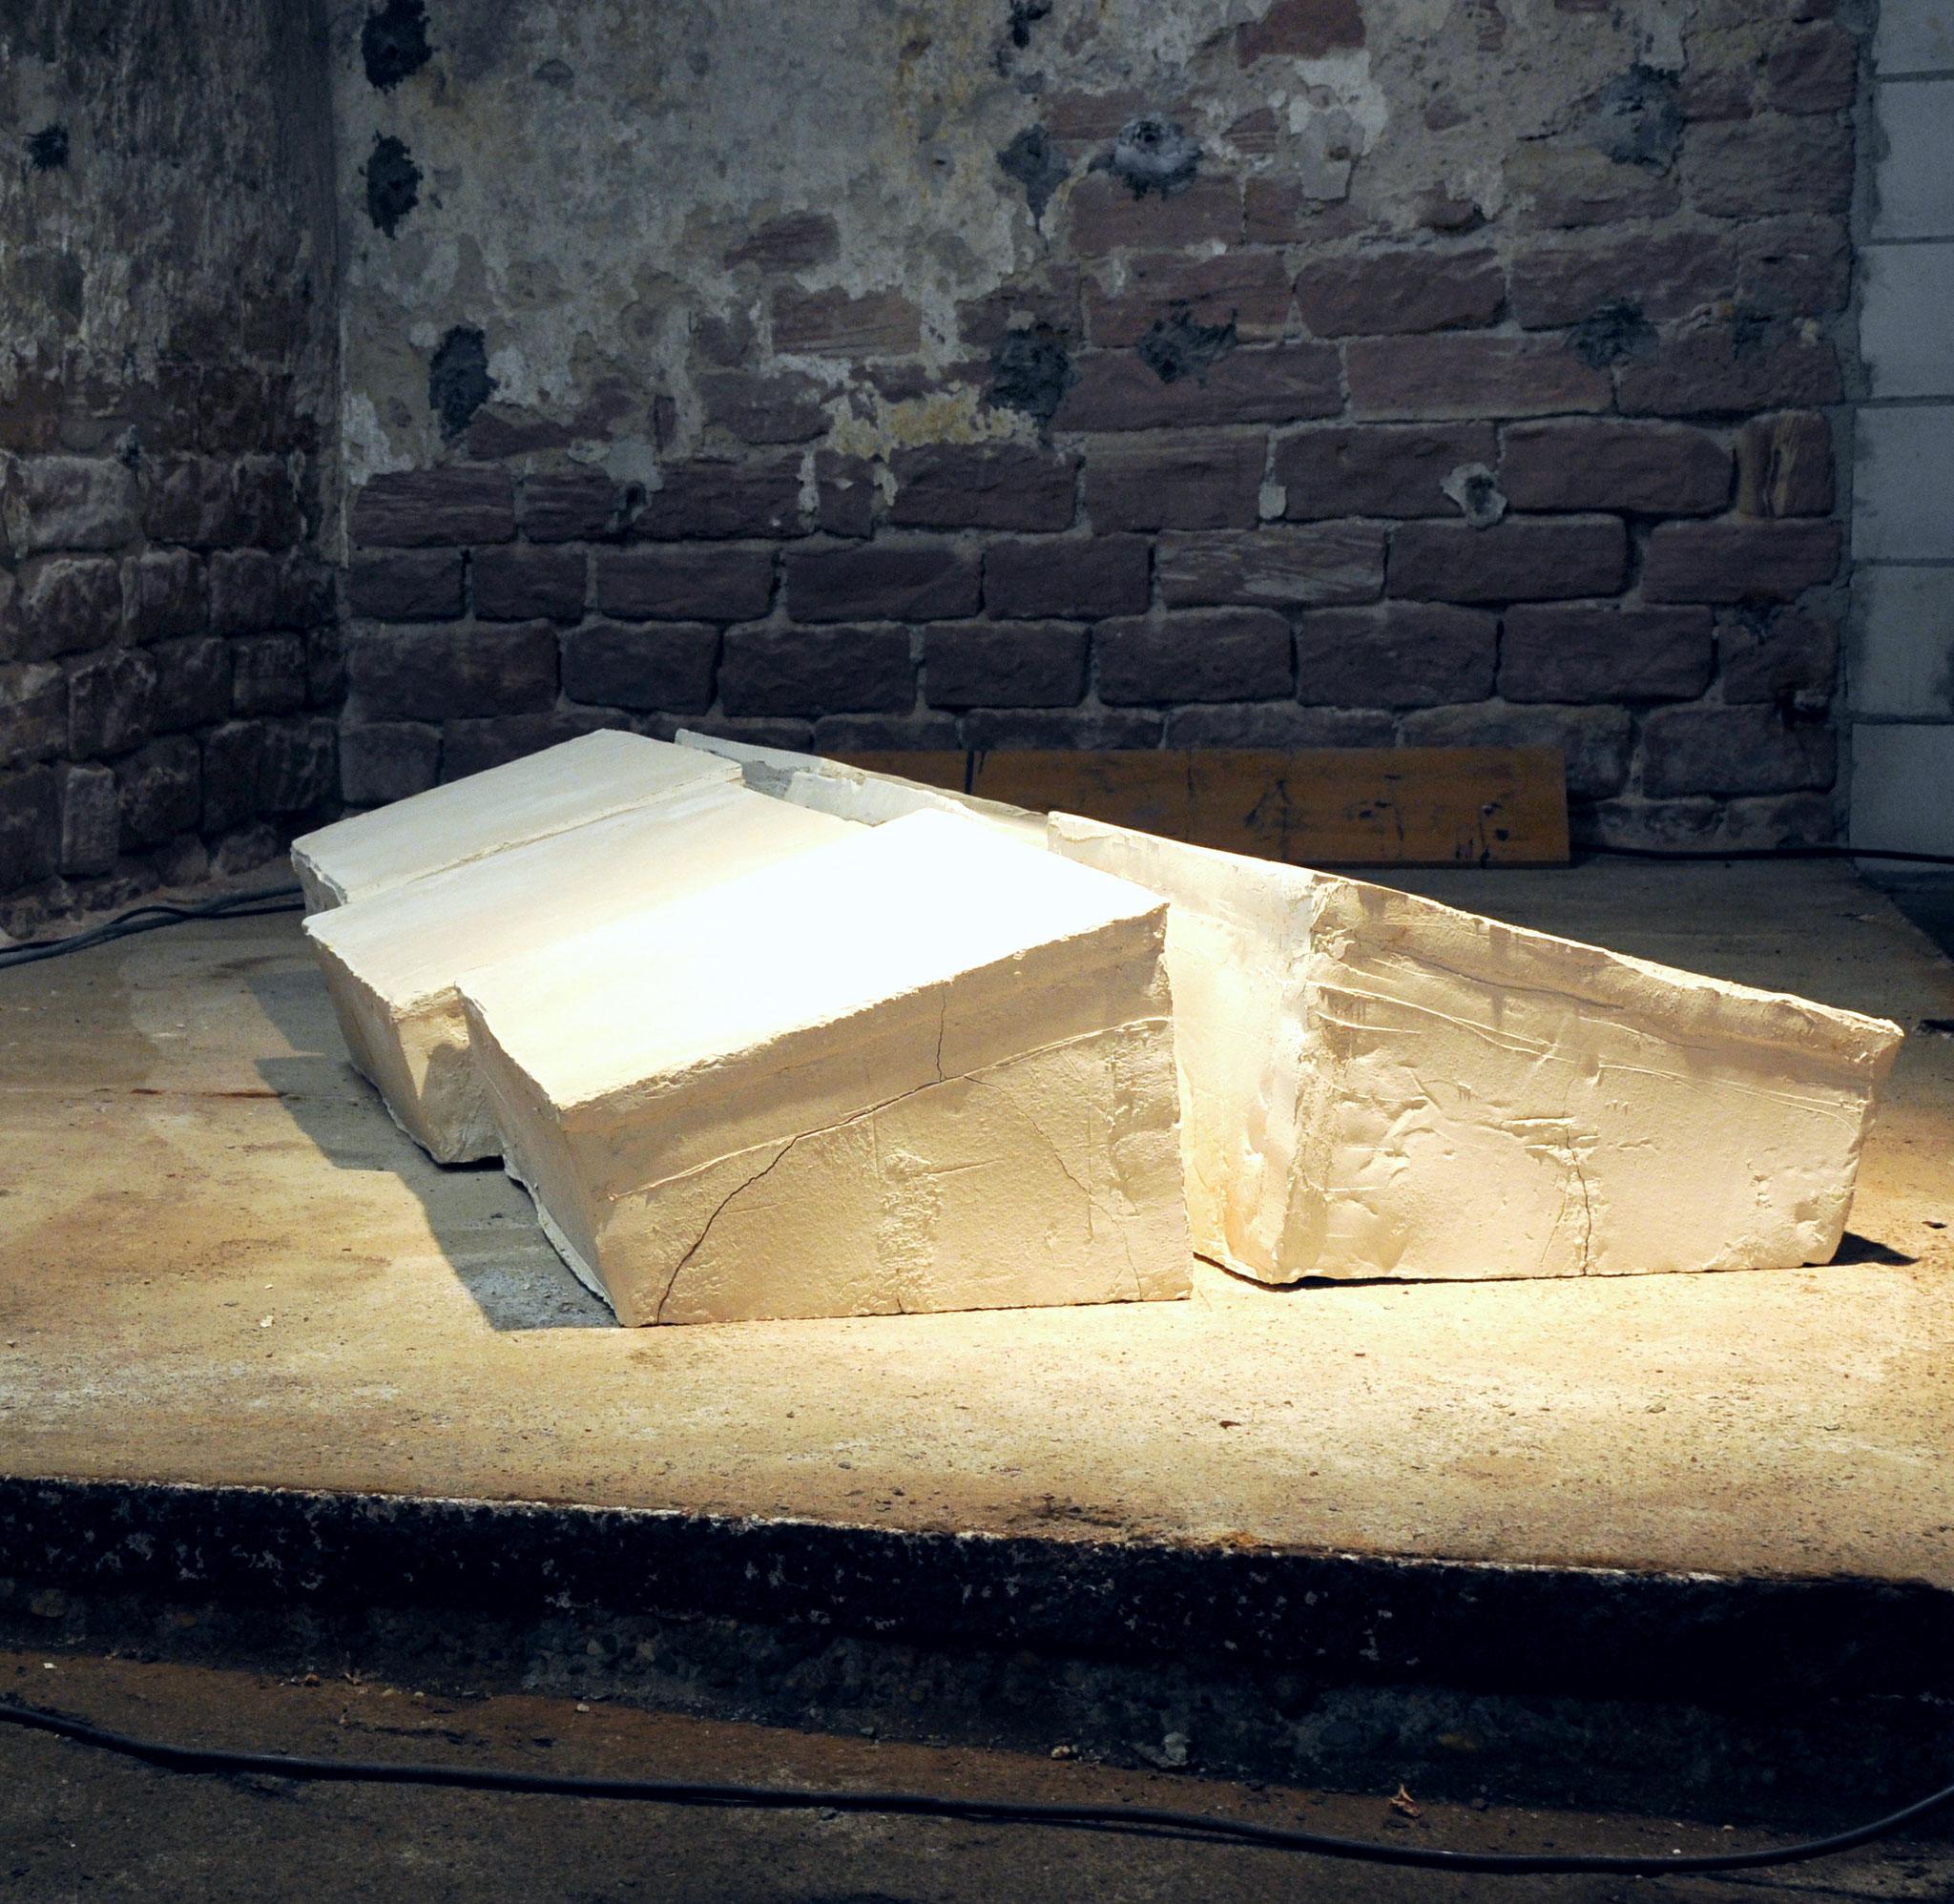 """VERSCHIEBUNGEN""  Ton,  6teilig, a 31 x 46 x 64 cm,  2008/2010"